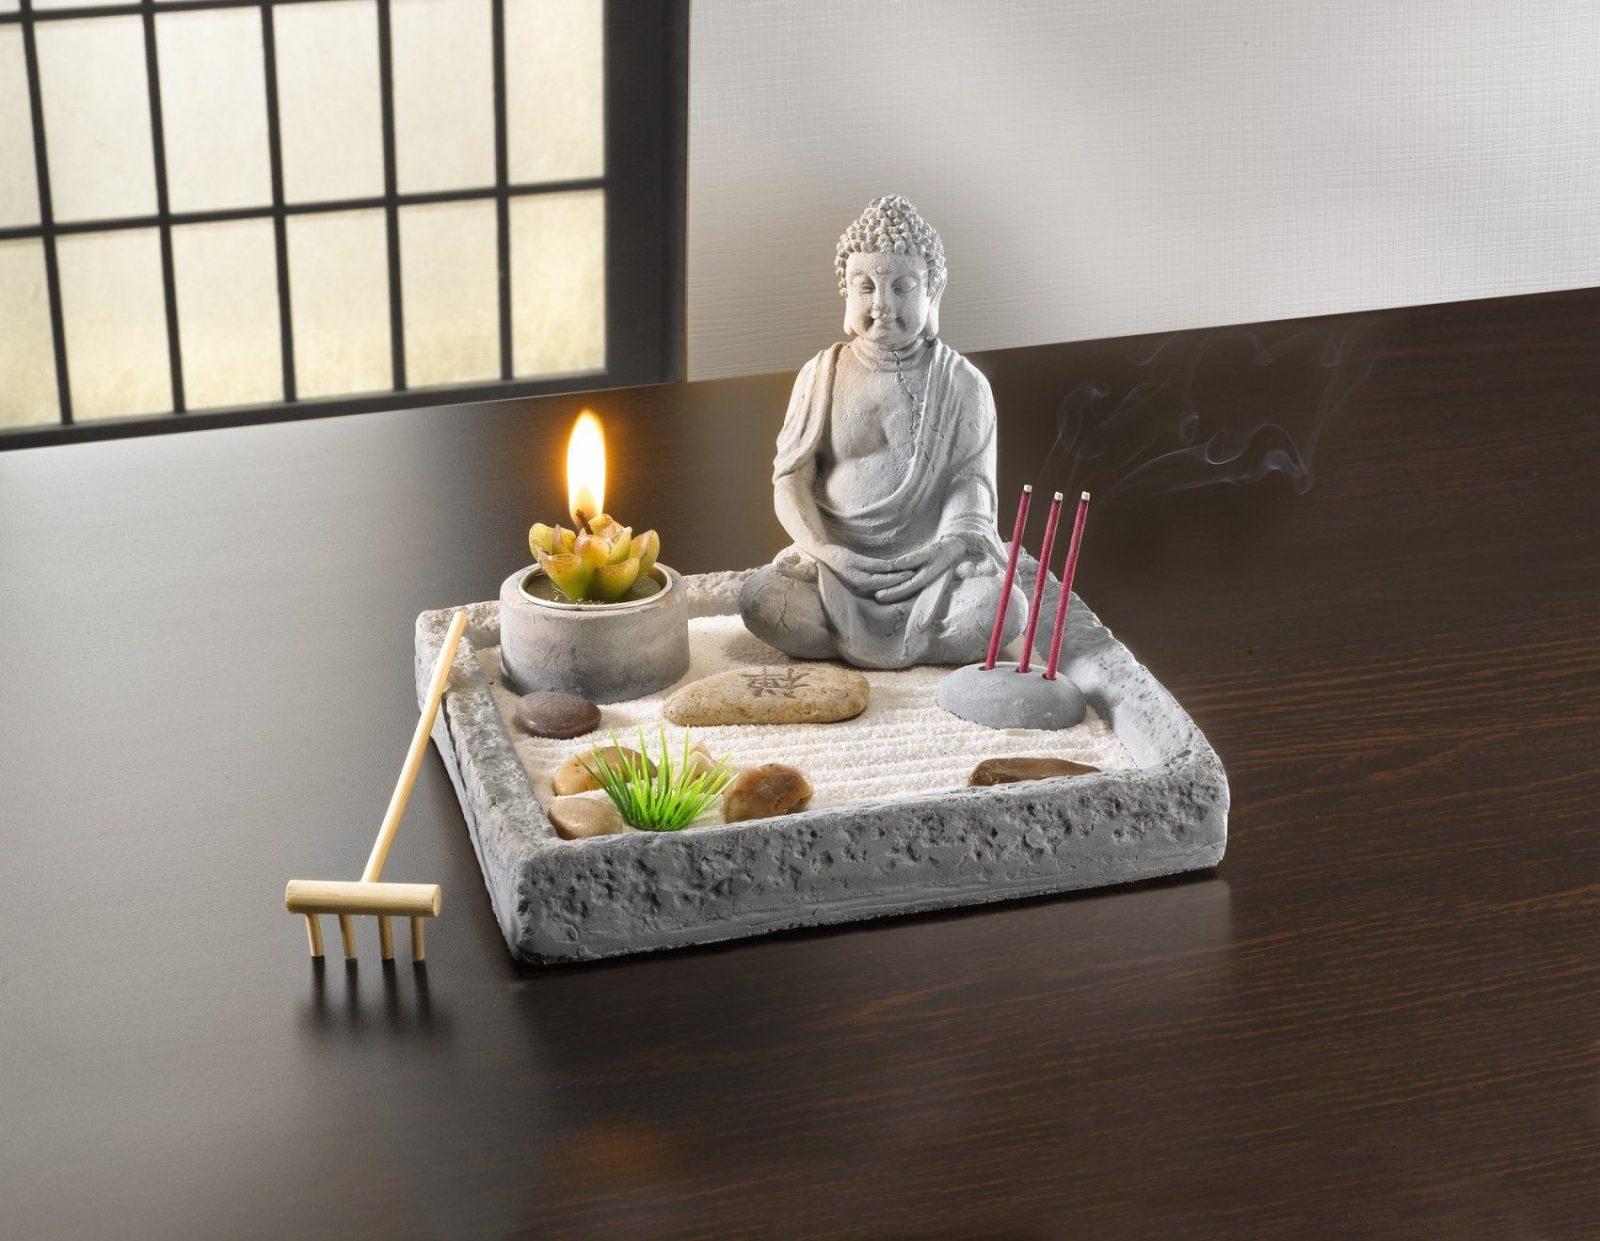 Deko Set Zen Garten Tischdeko Feng Shui Japan Asia Style Avec Zen von Japanische Deko Für Den Garten Photo